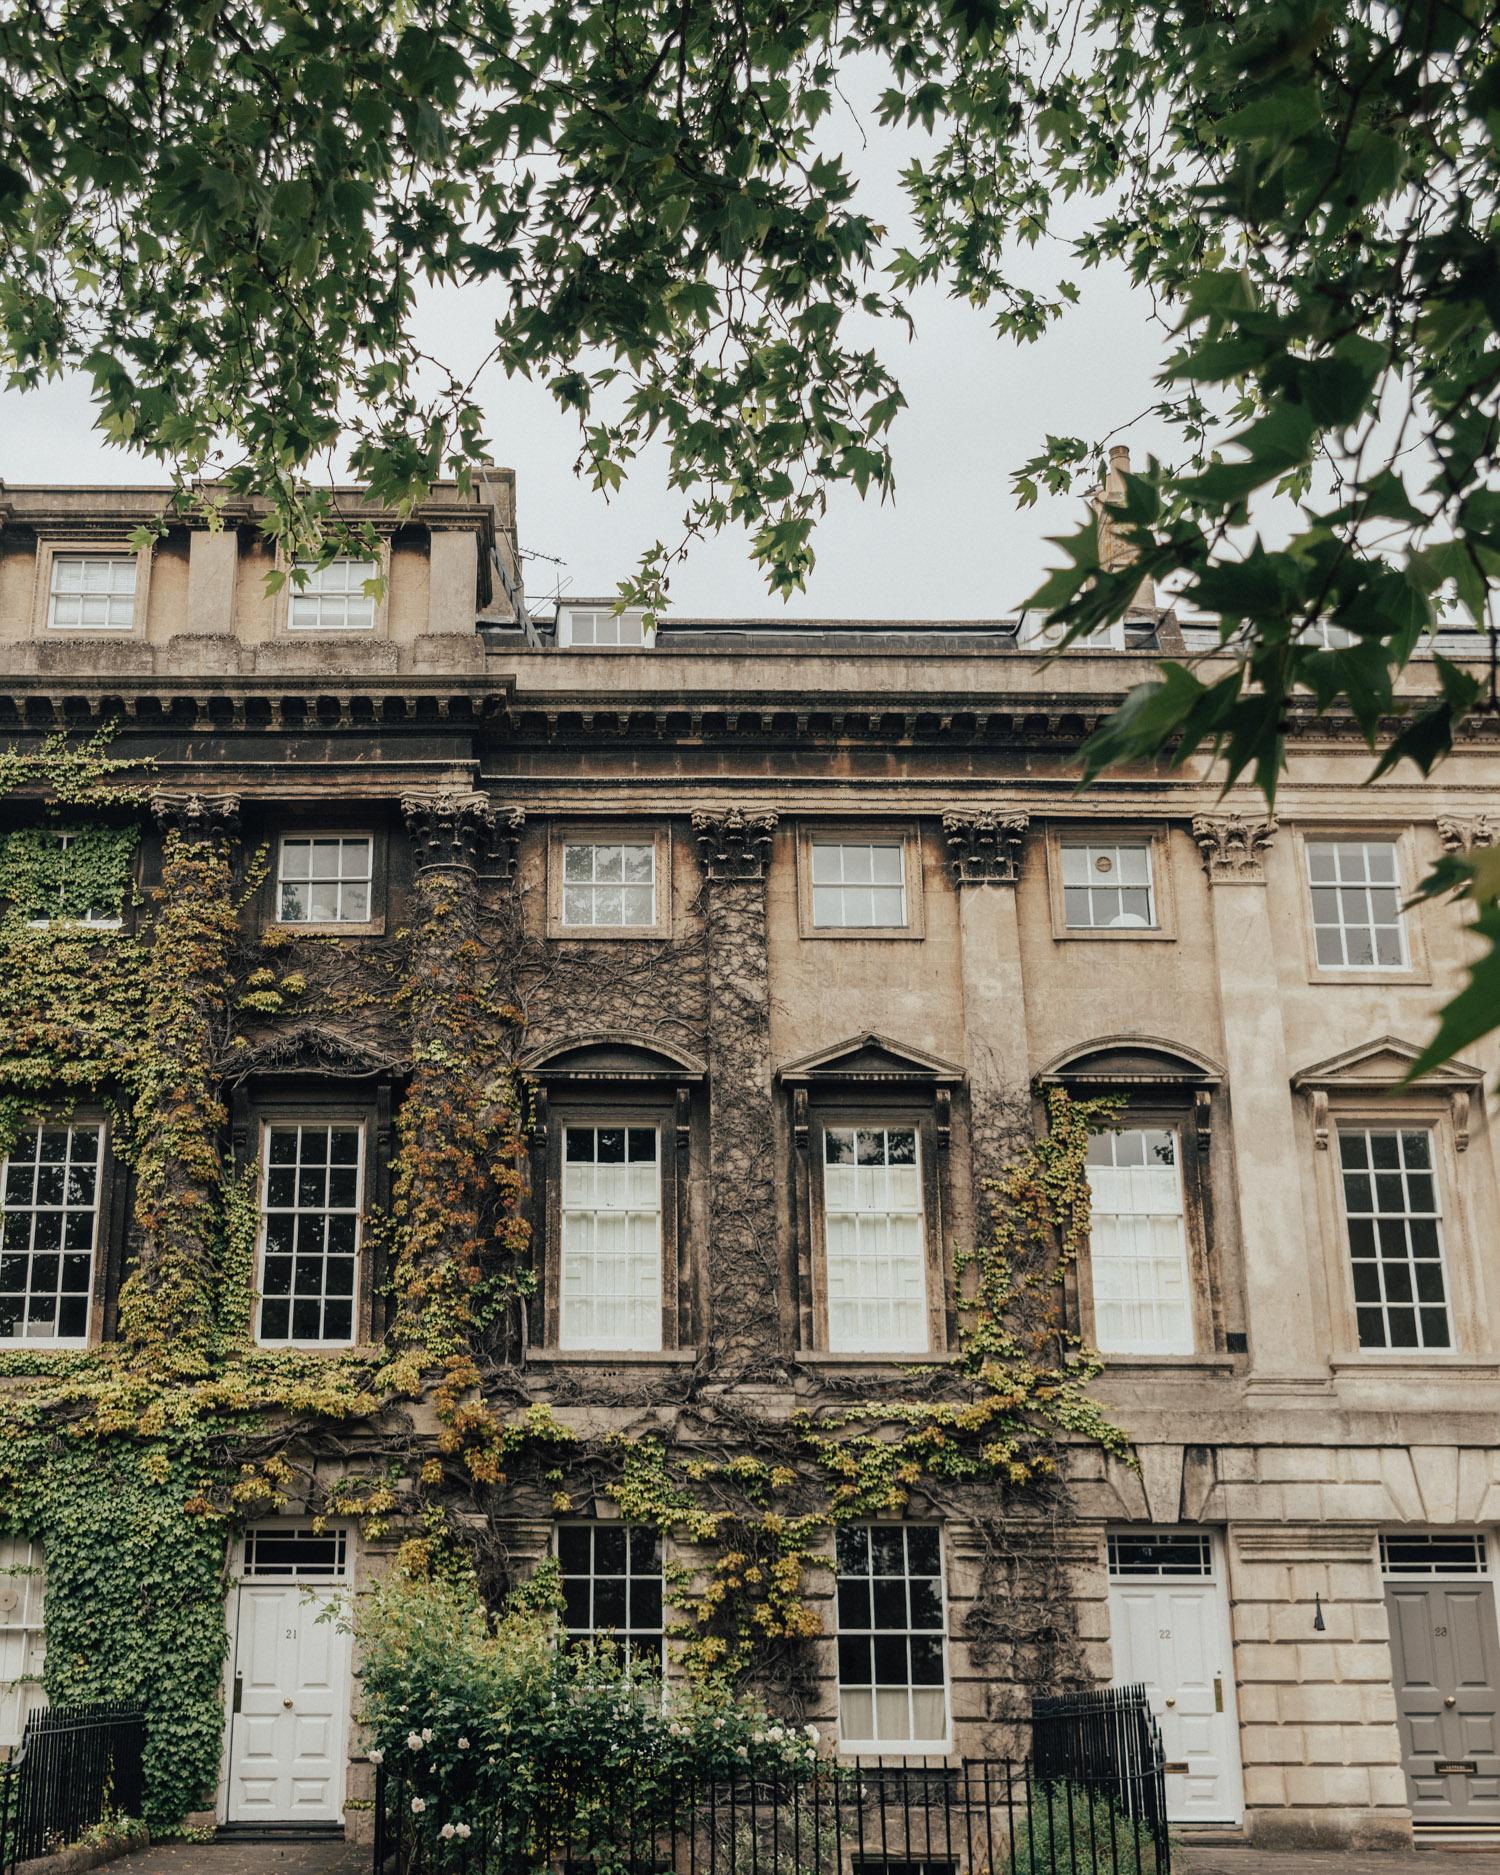 Georgian architecture in Bath, Somerset, UK